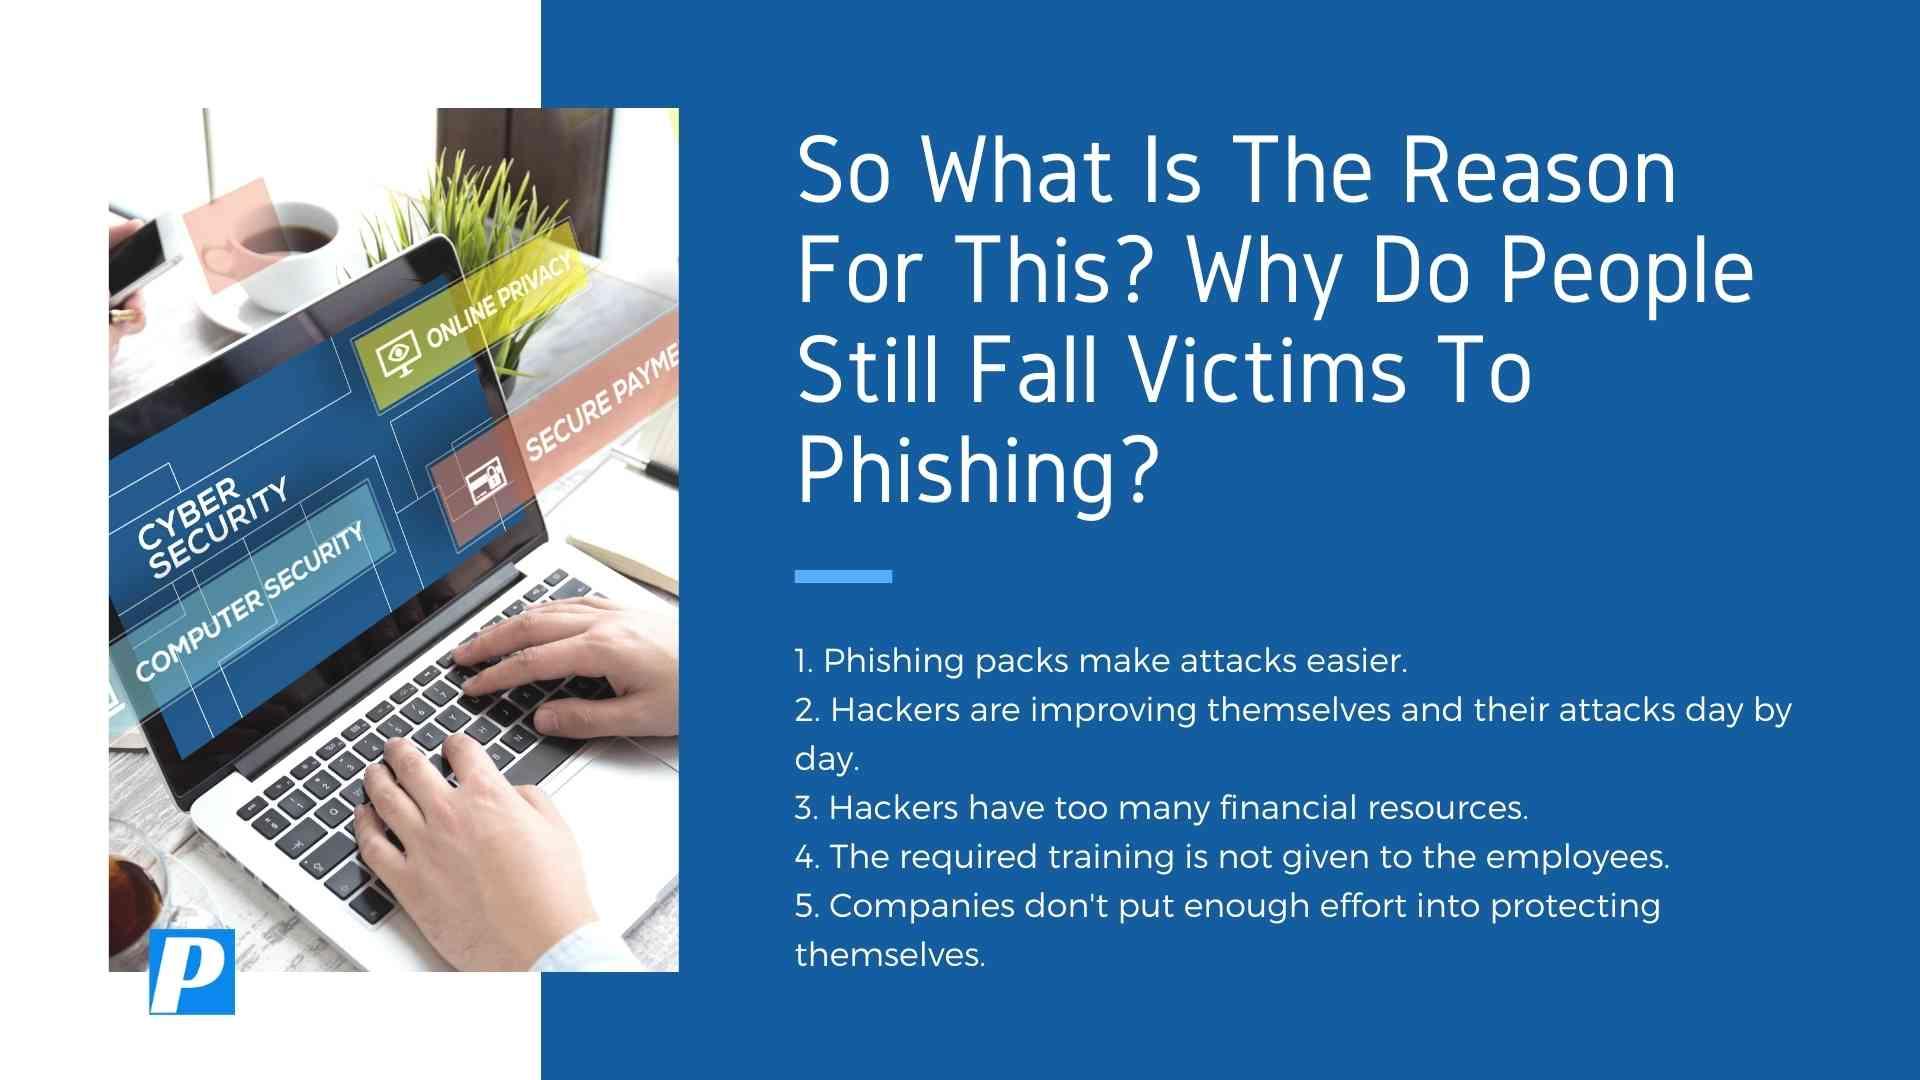 People Still Fall Victim to Phishing